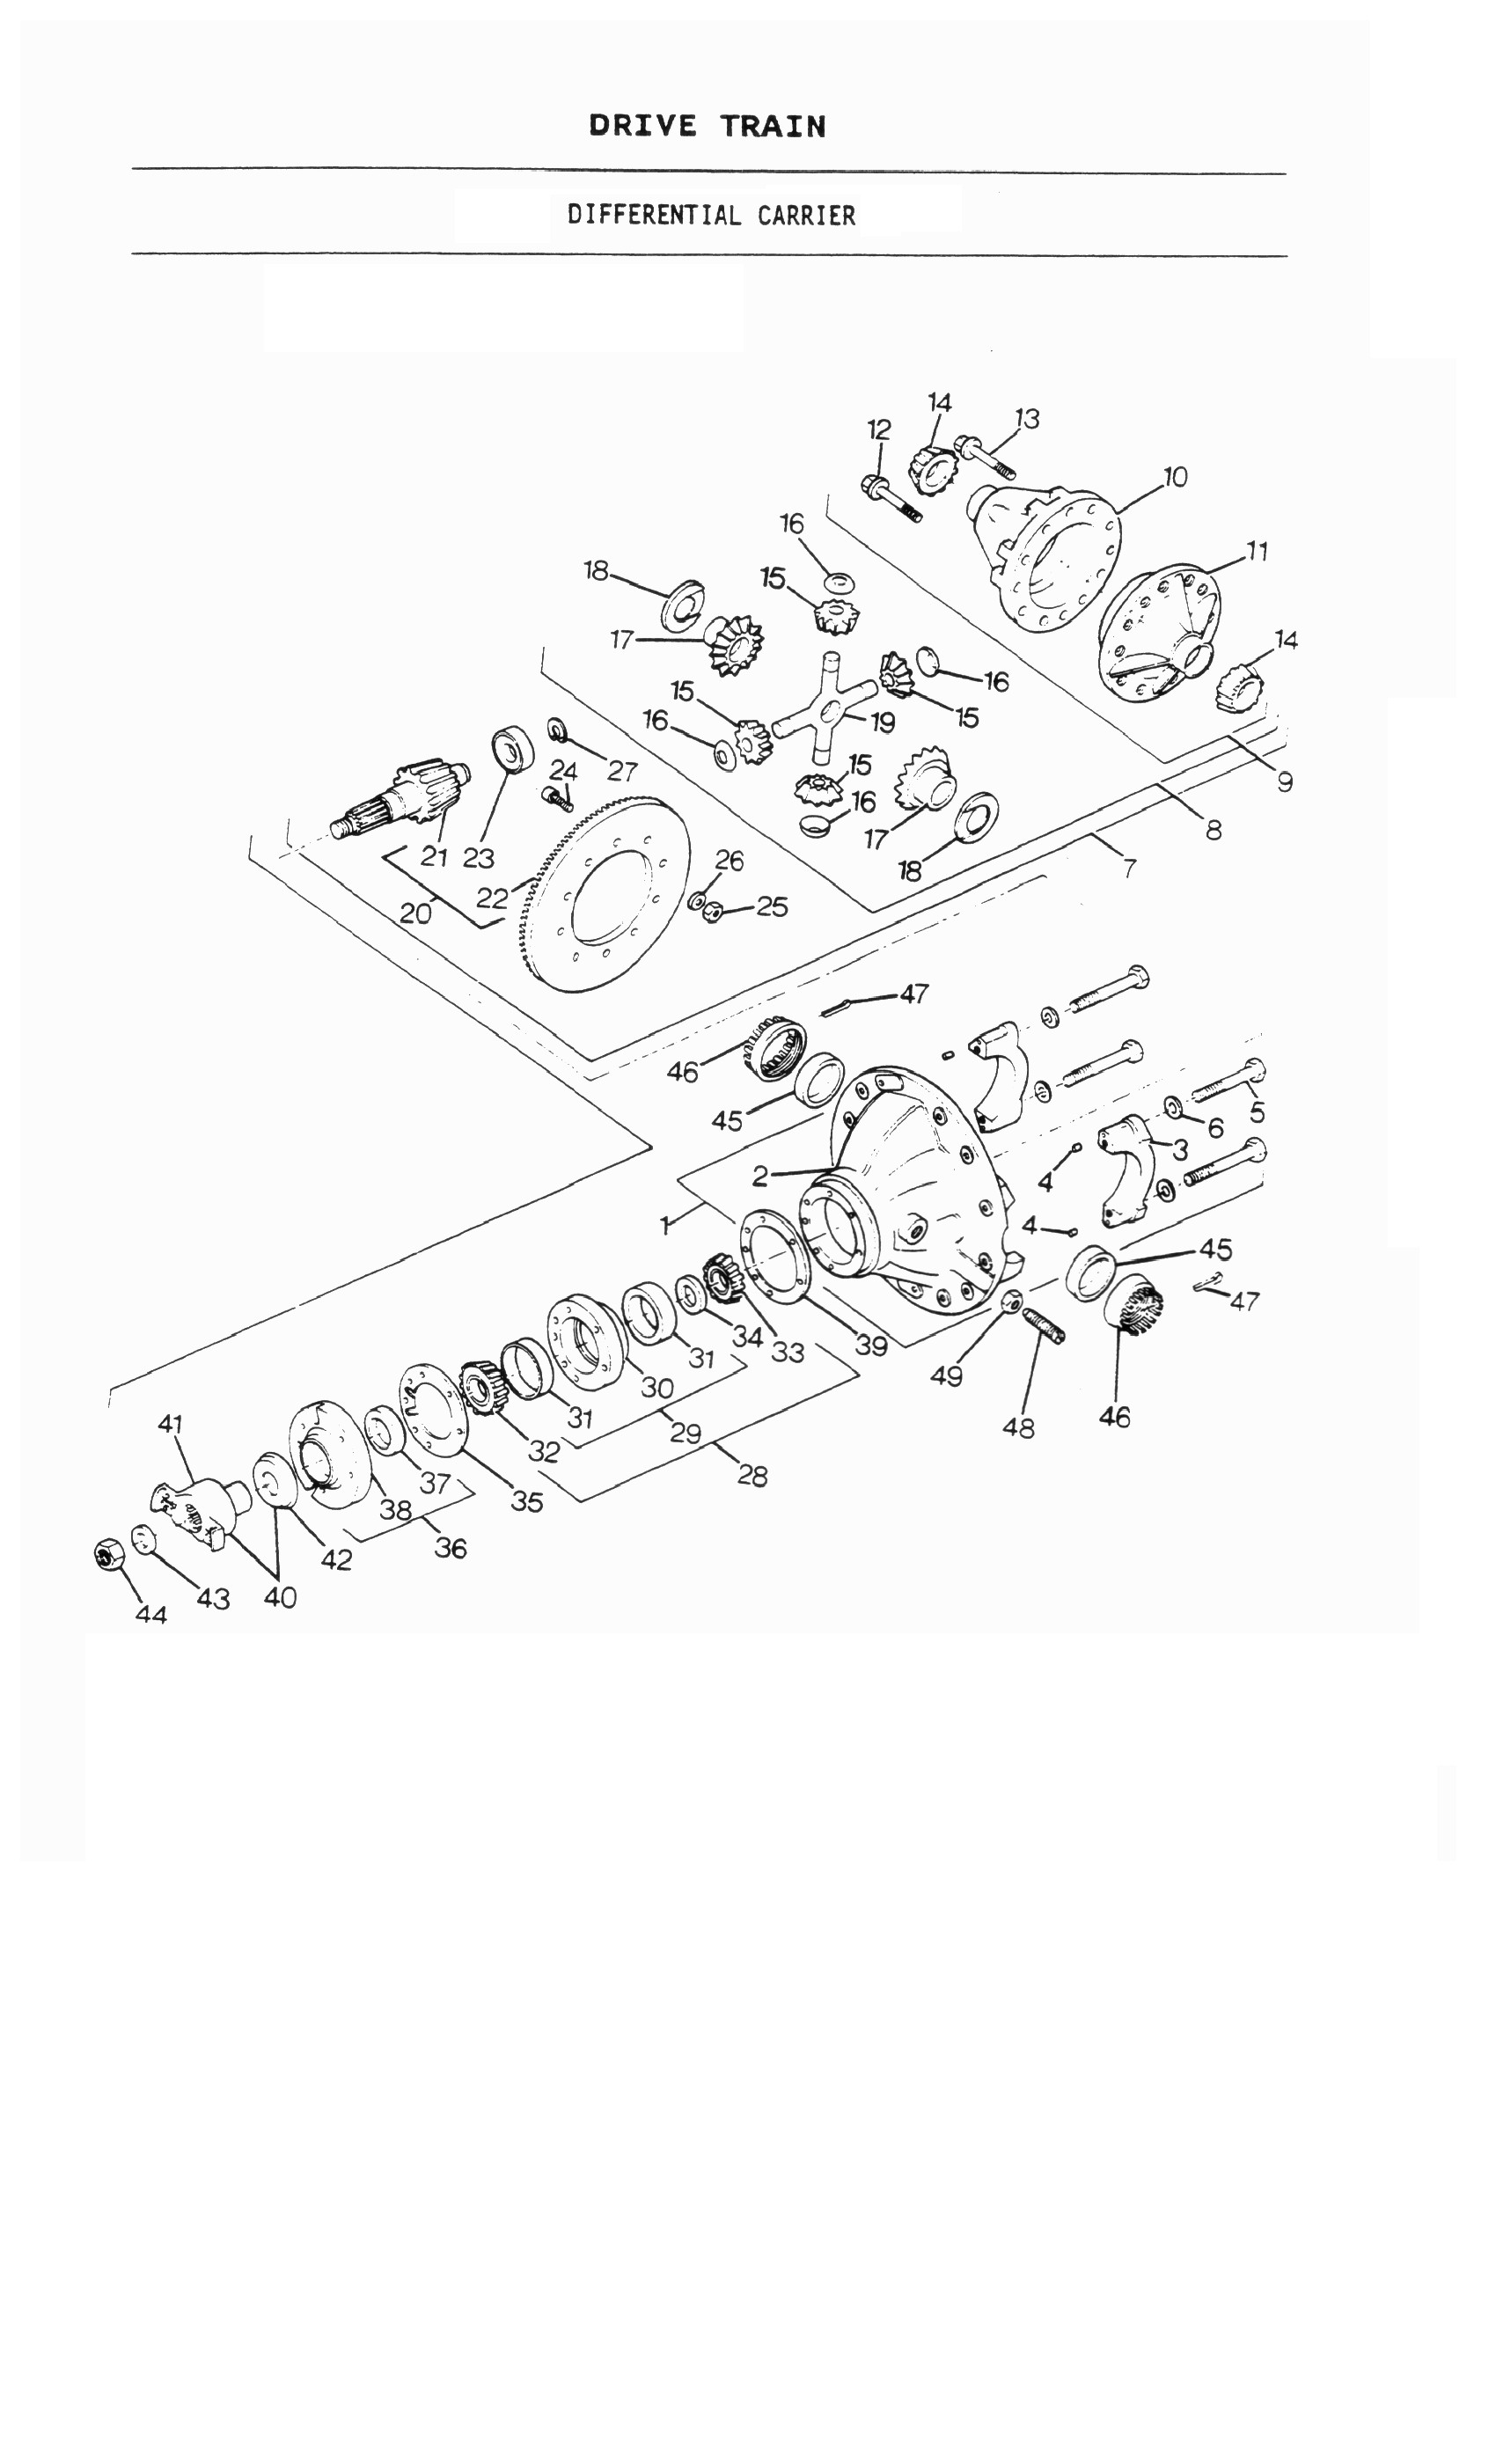 Bobcat Parts Schematic. Parts. Wiring Diagram Images